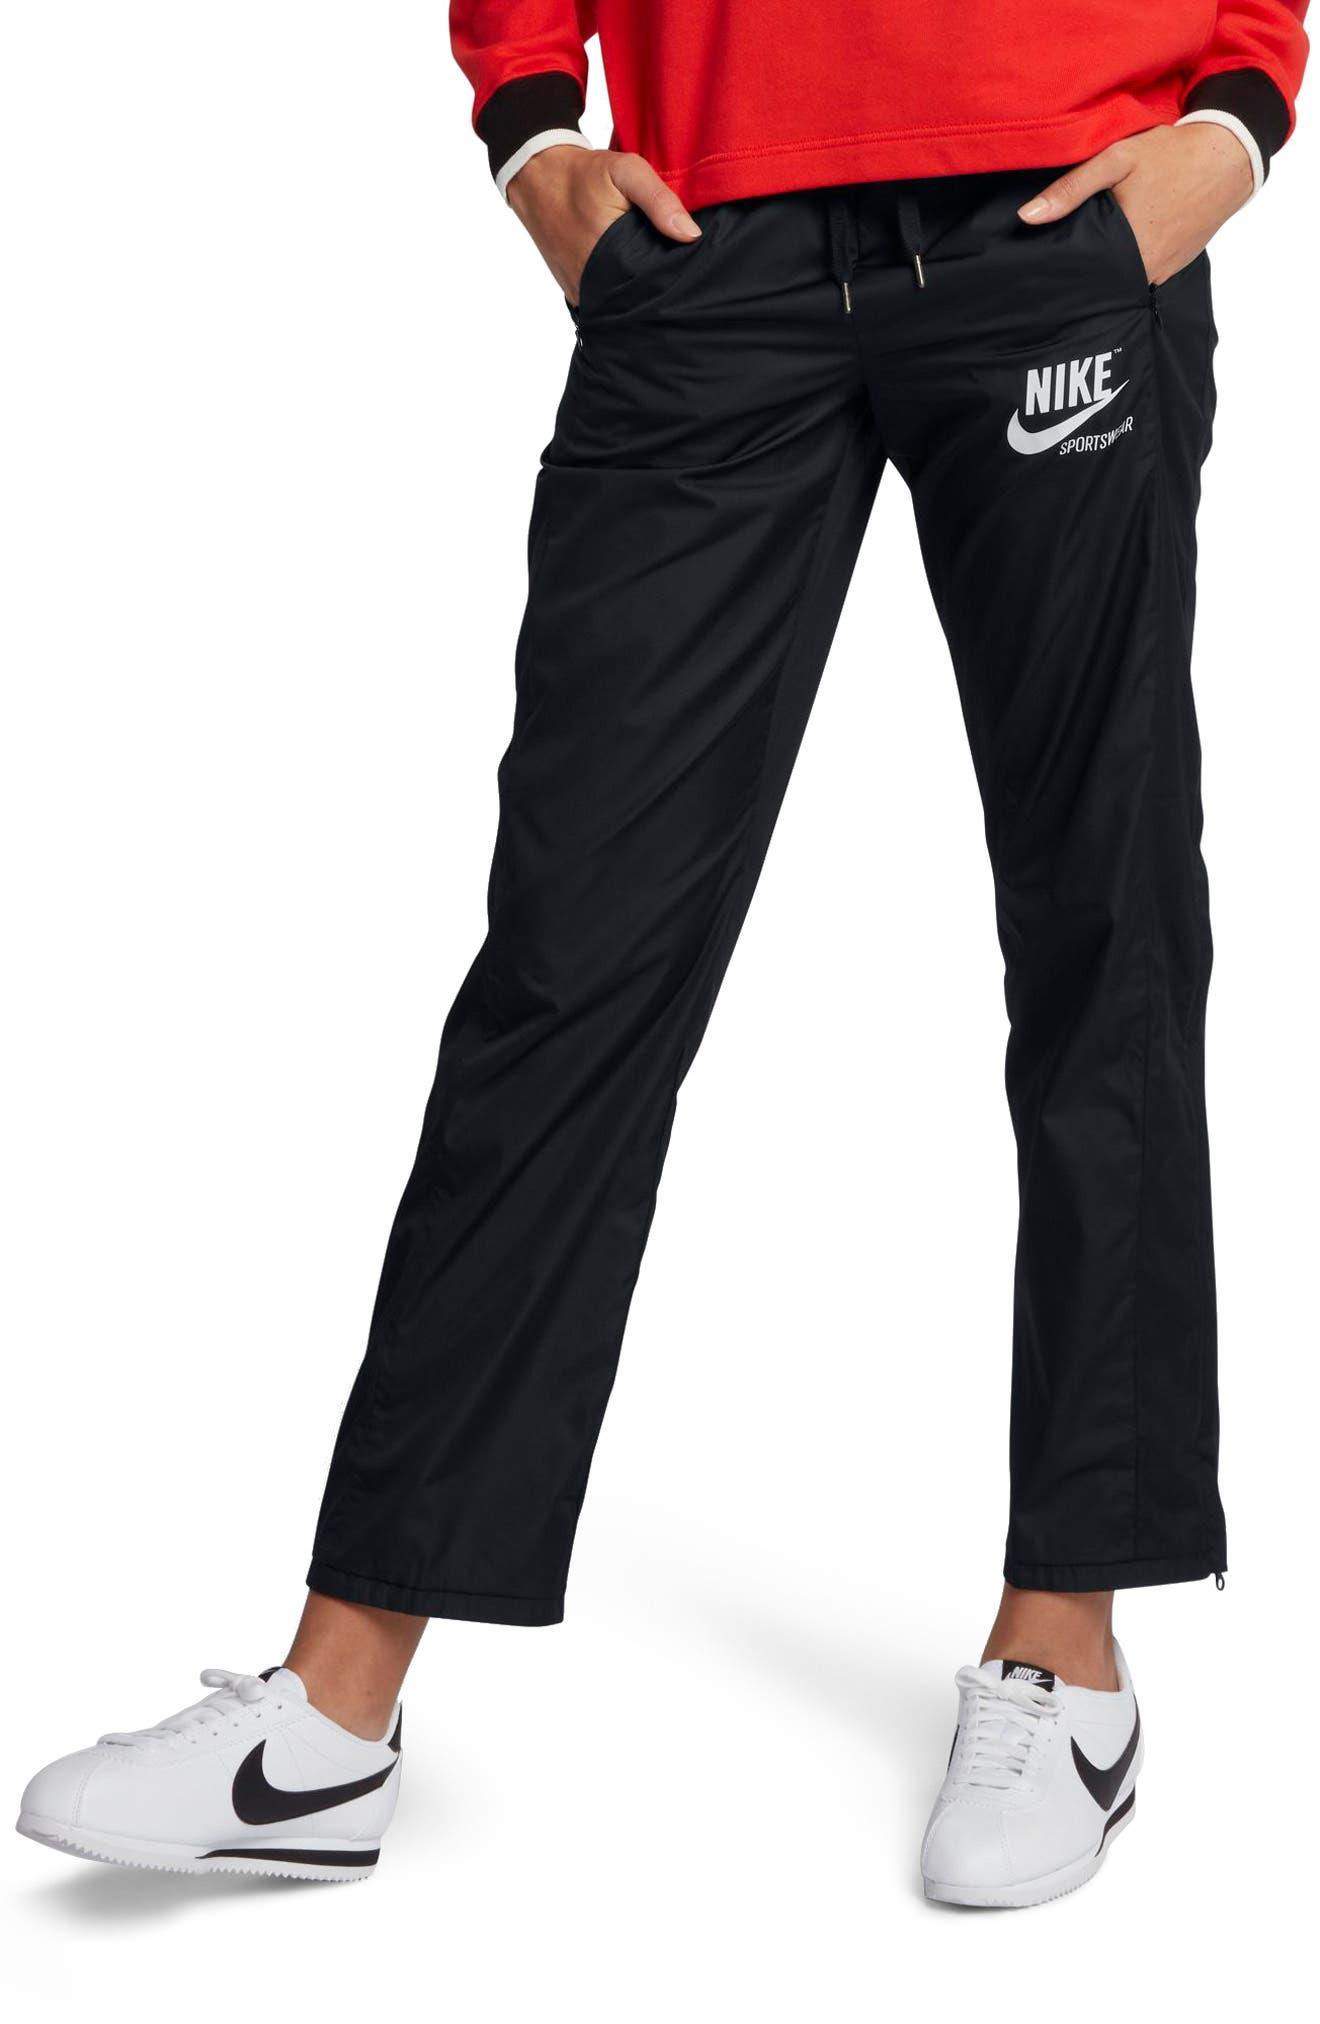 Sportswear Women's Stretch Faille Pants,                             Main thumbnail 1, color,                             Black